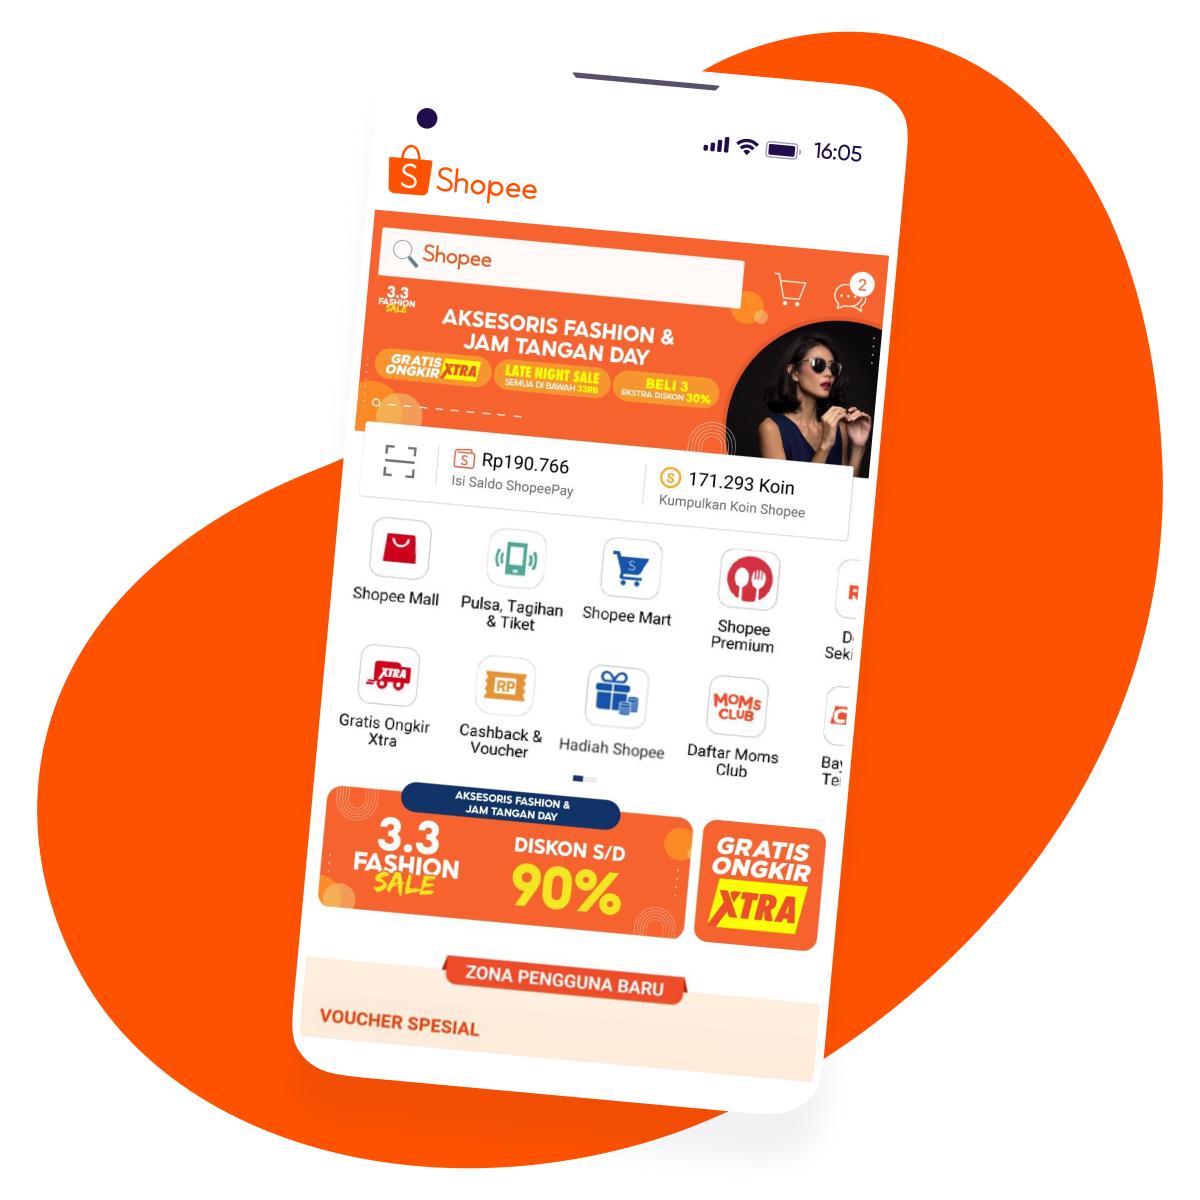 Shopee AppsFlyer Customer